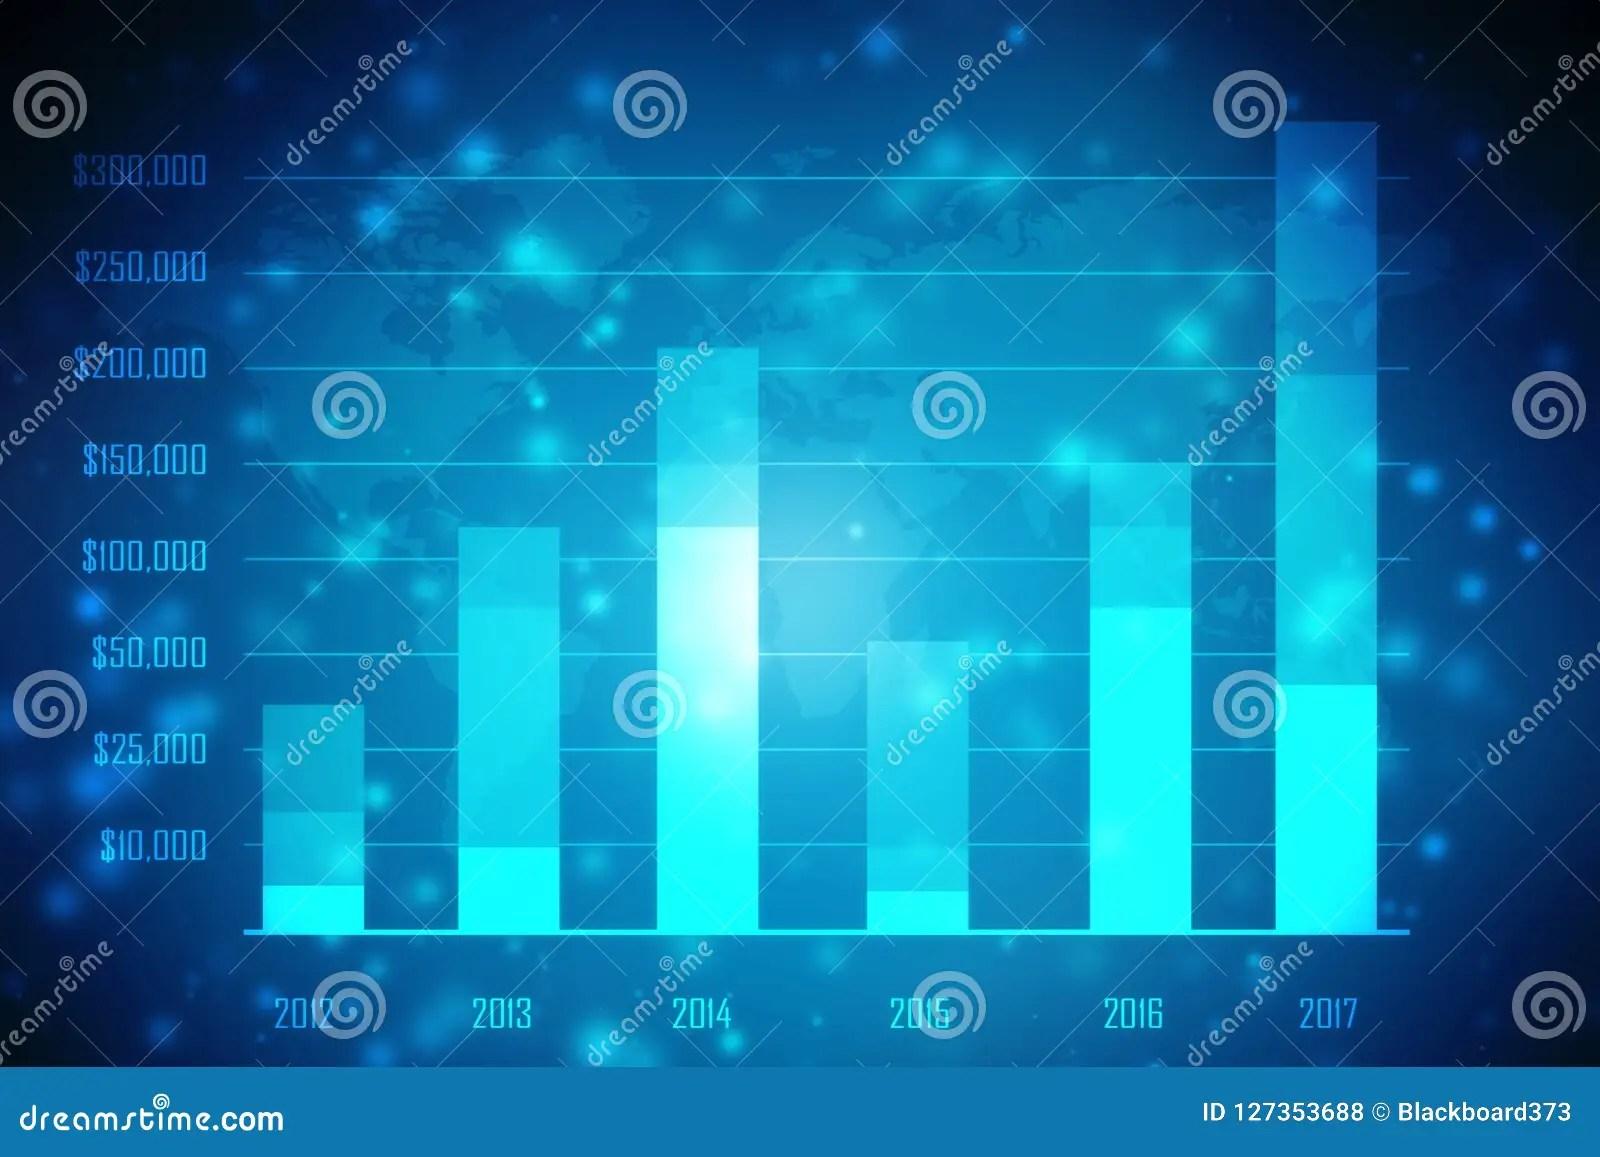 stock market chart business